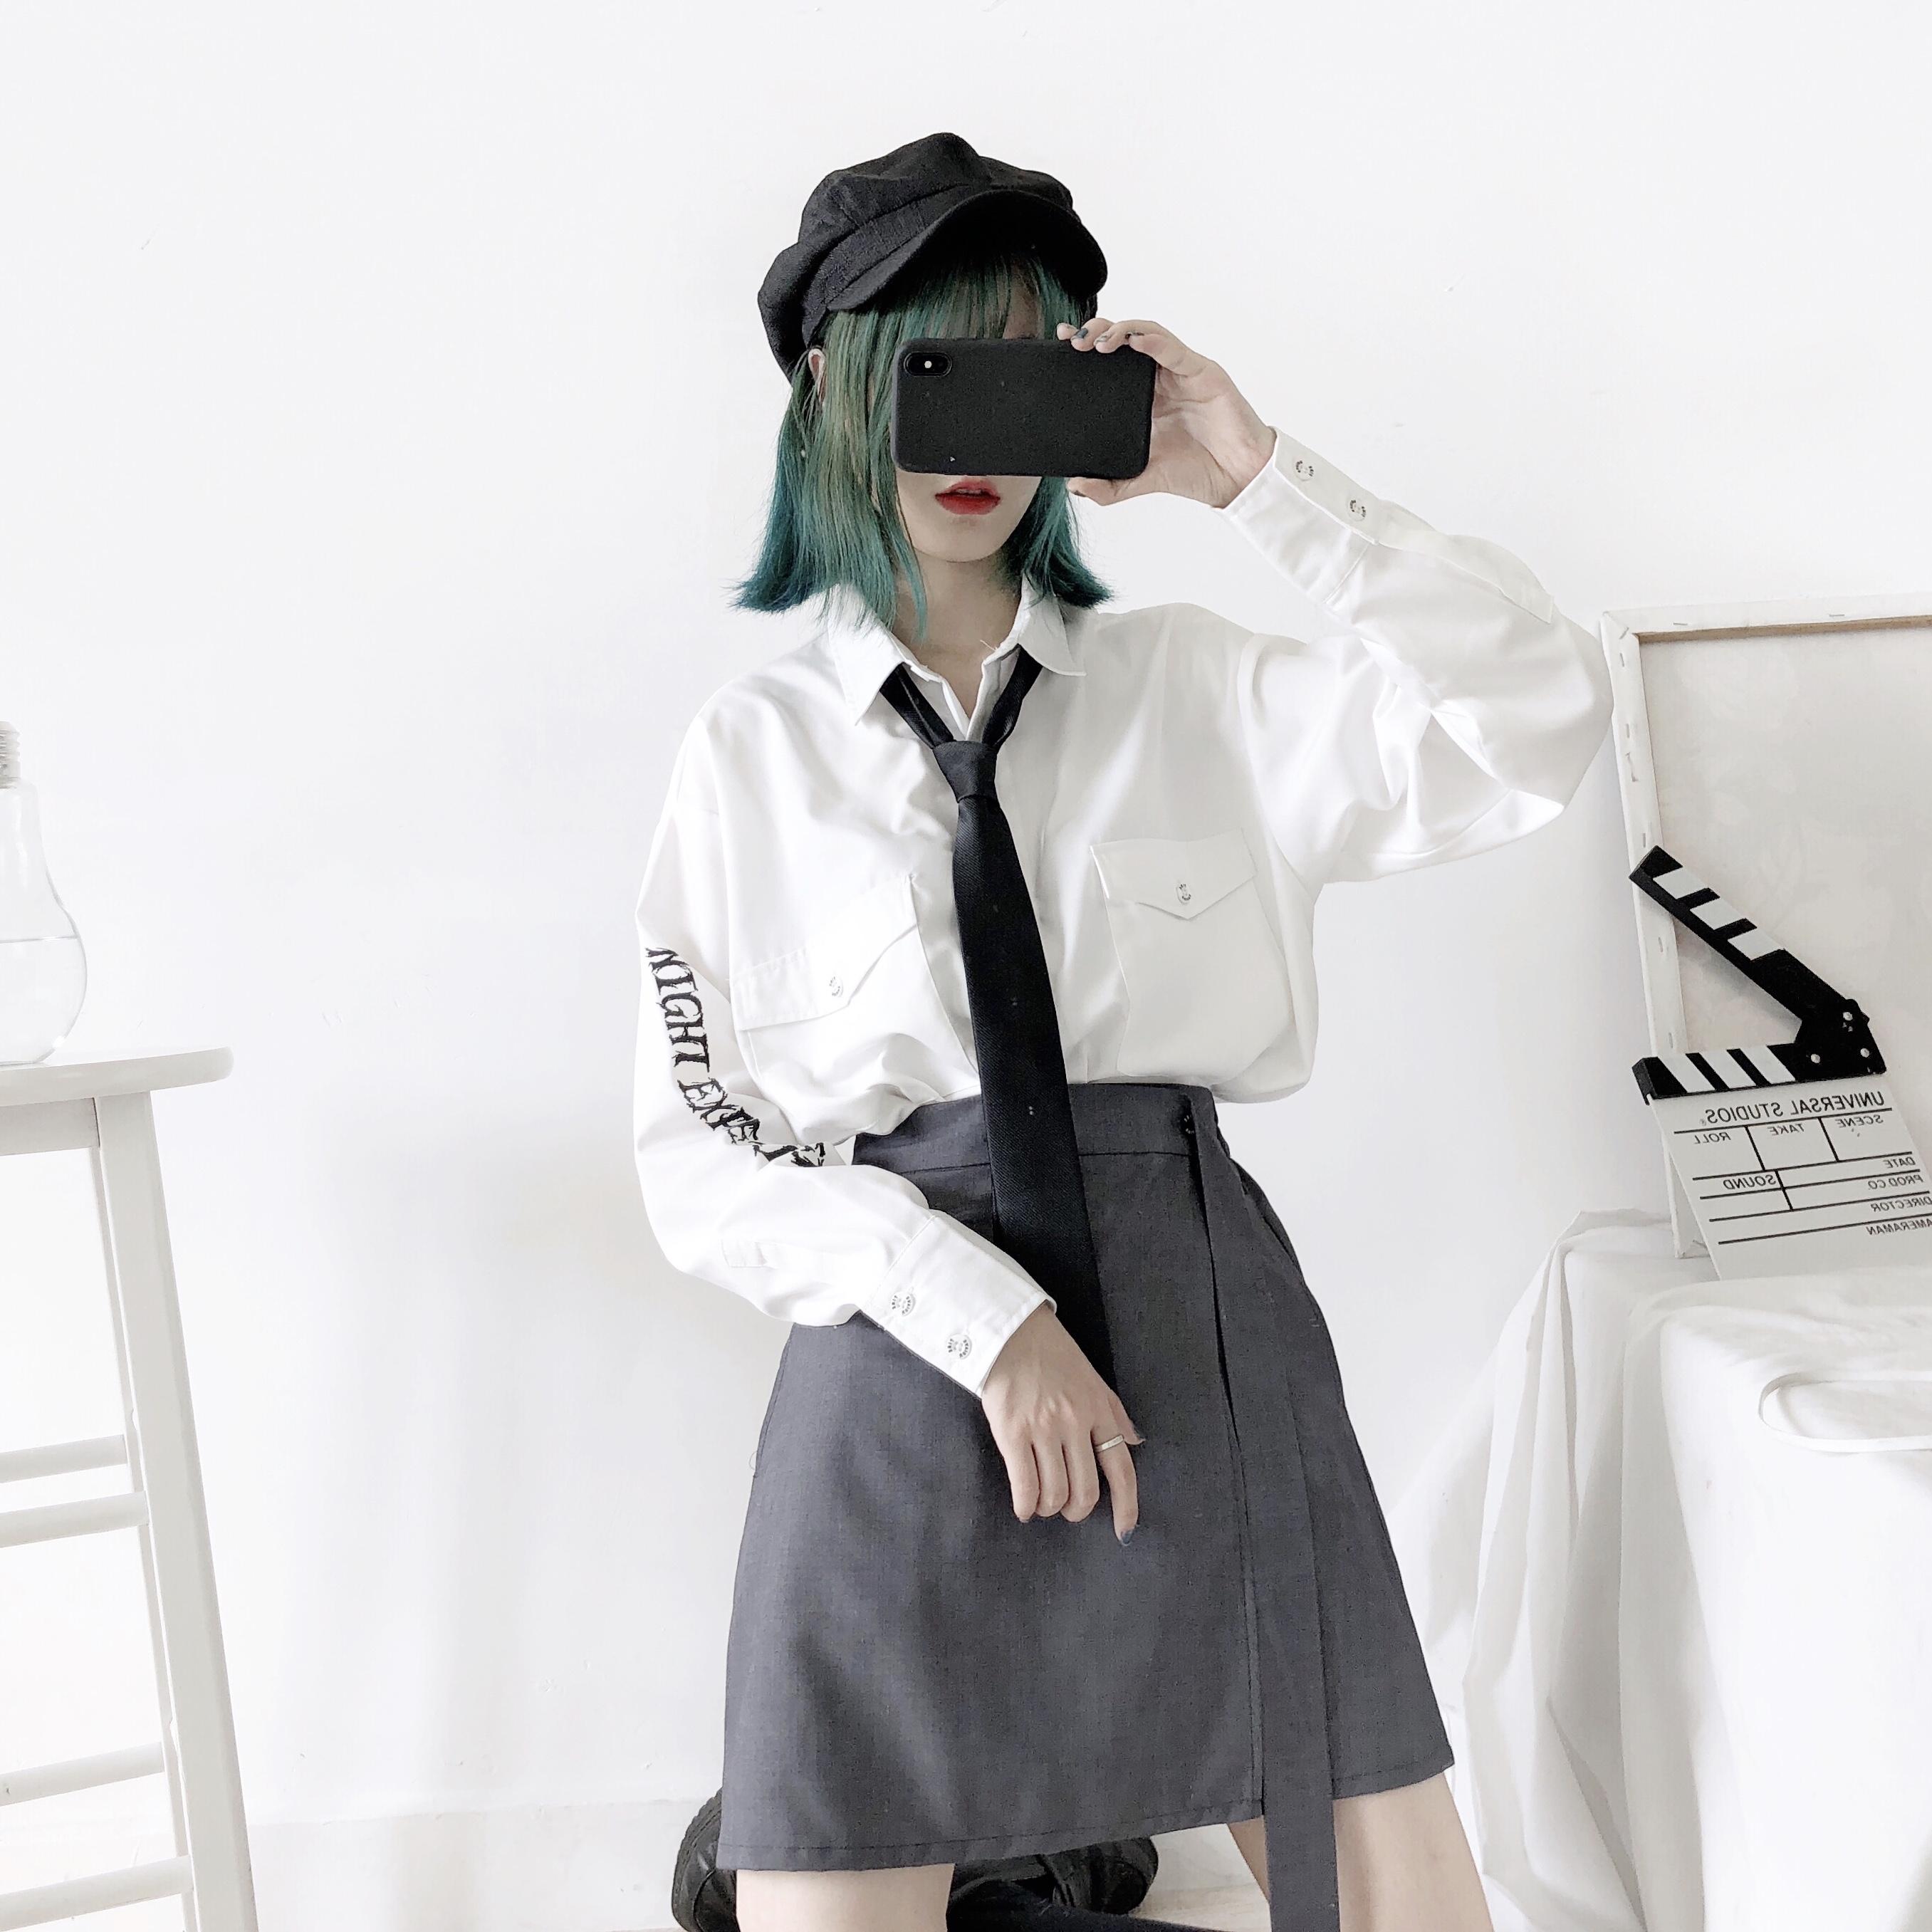 PINKSAVIOR夜间实验白灰两色印花特别设计款衬衫(领带赠送)